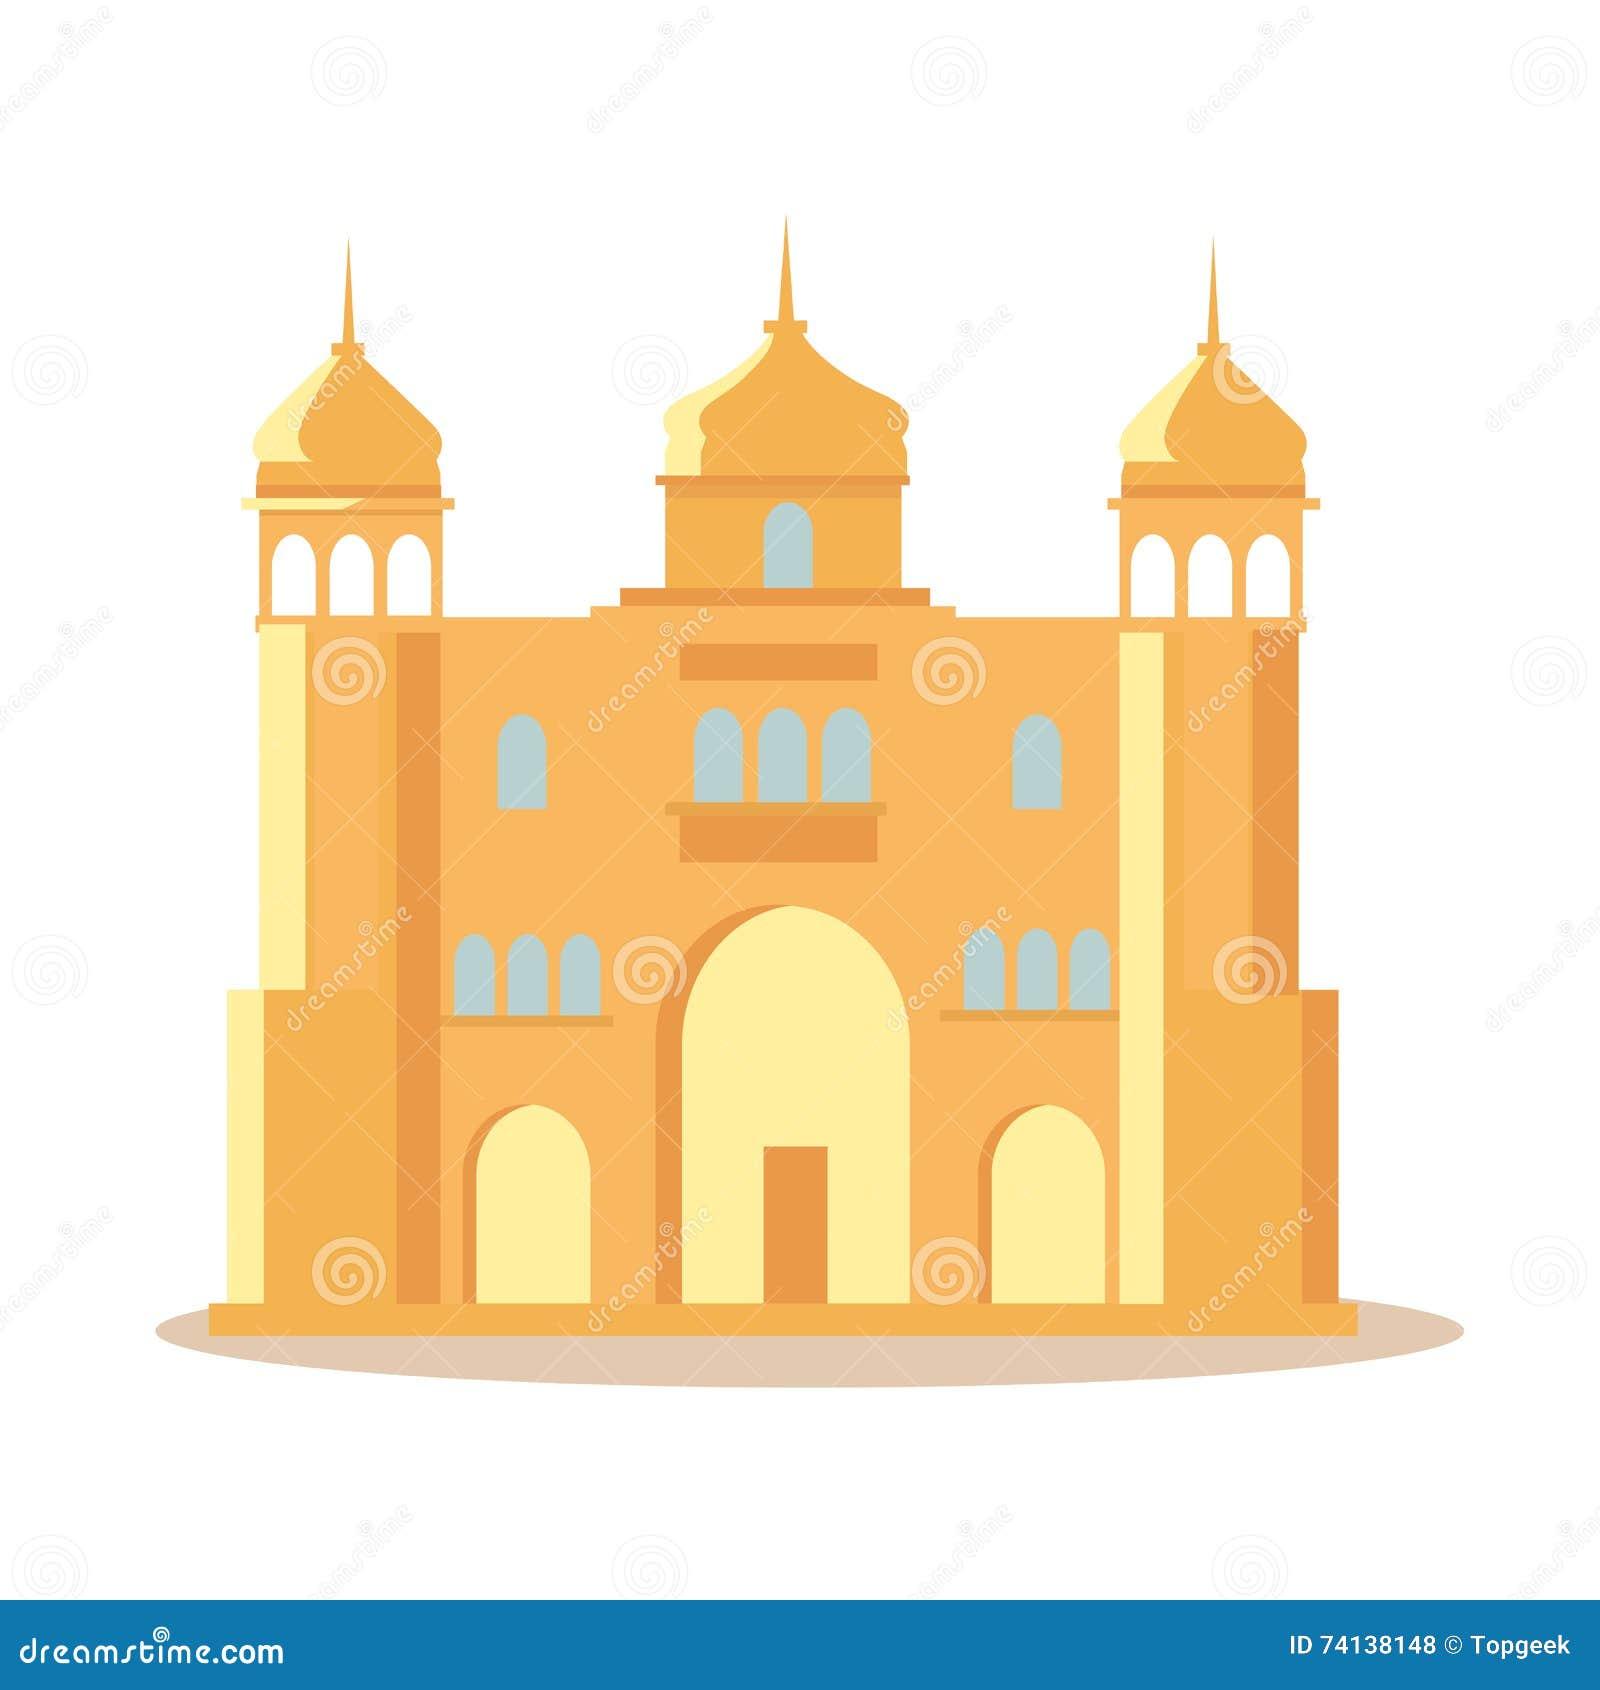 India ska pa ac ilustracja w p askim projekcie ilustracja Design a castle online